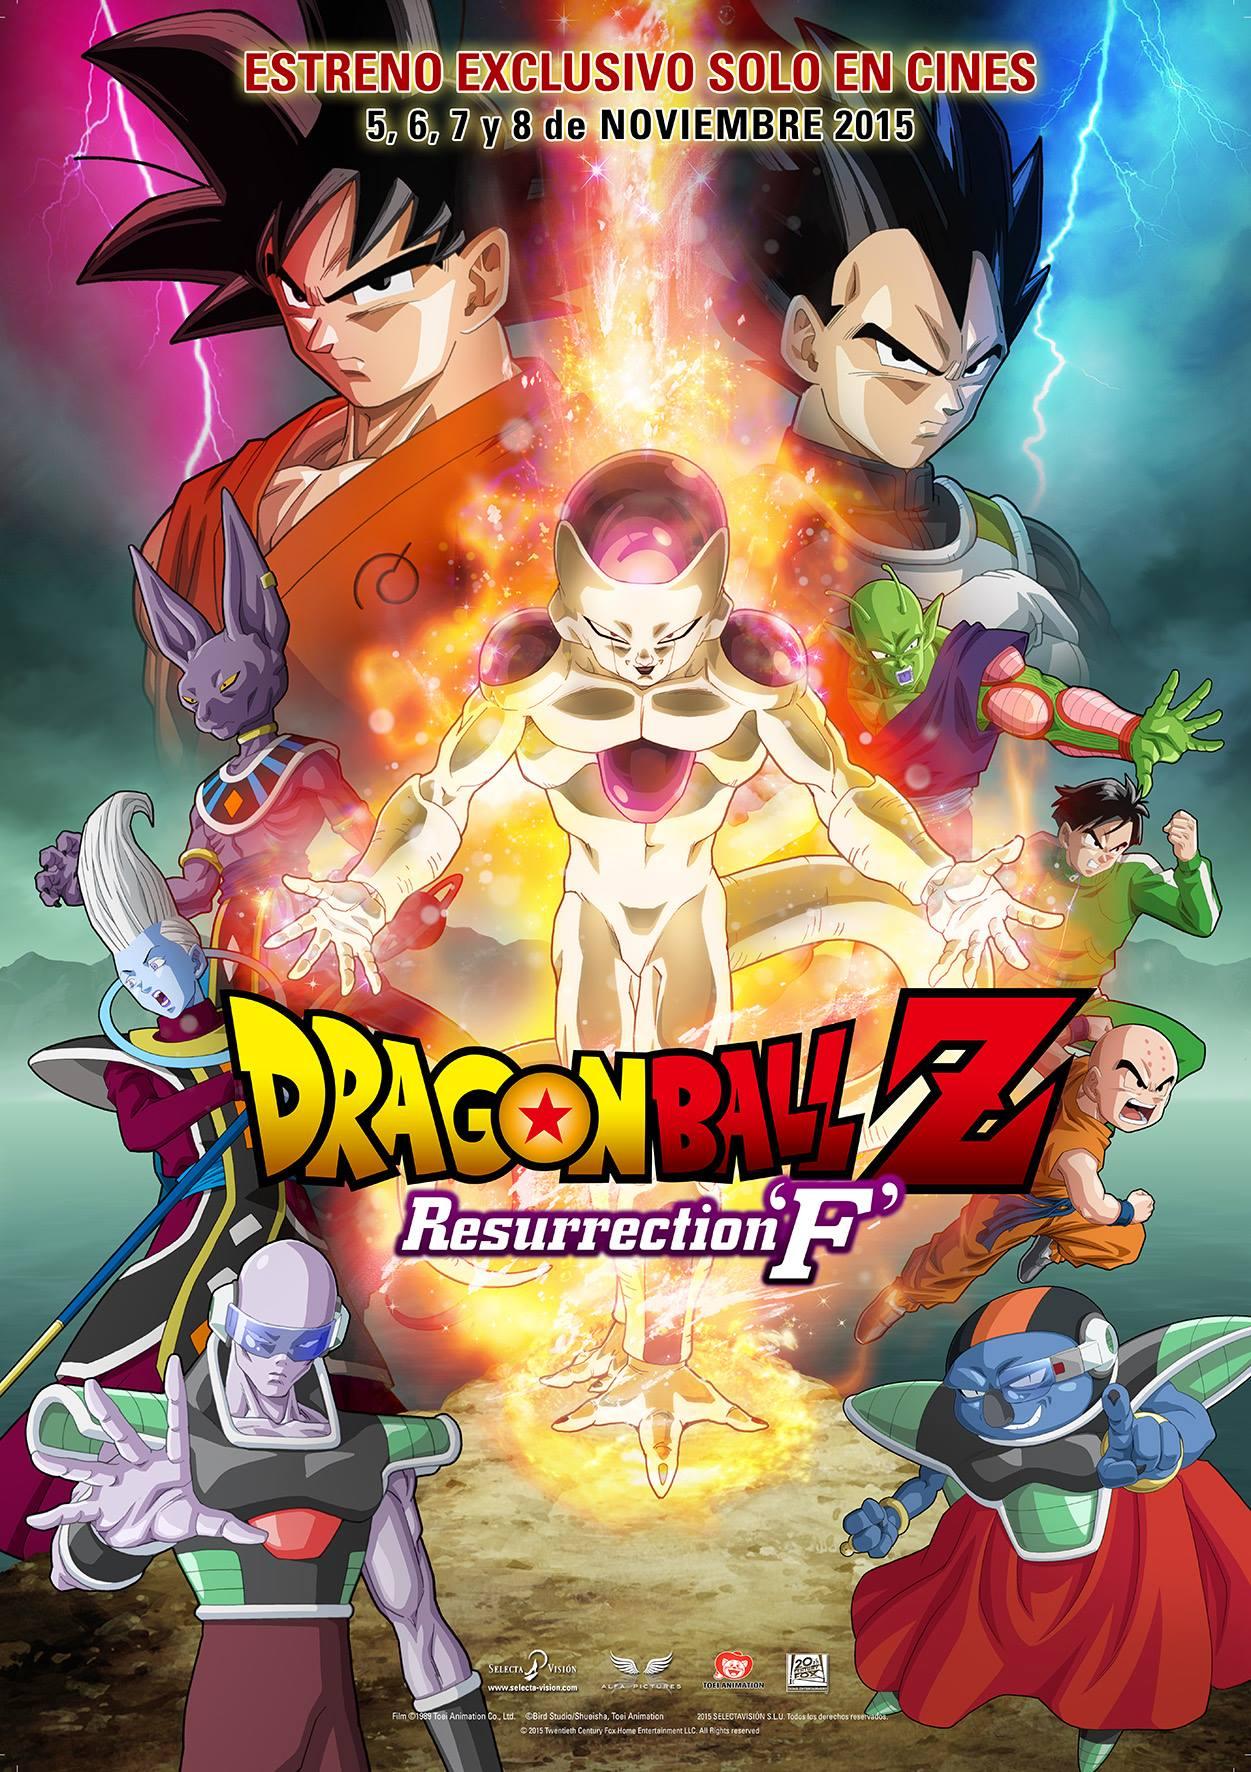 Dragon-Ball-Z-Resurrection-F-Poster-3